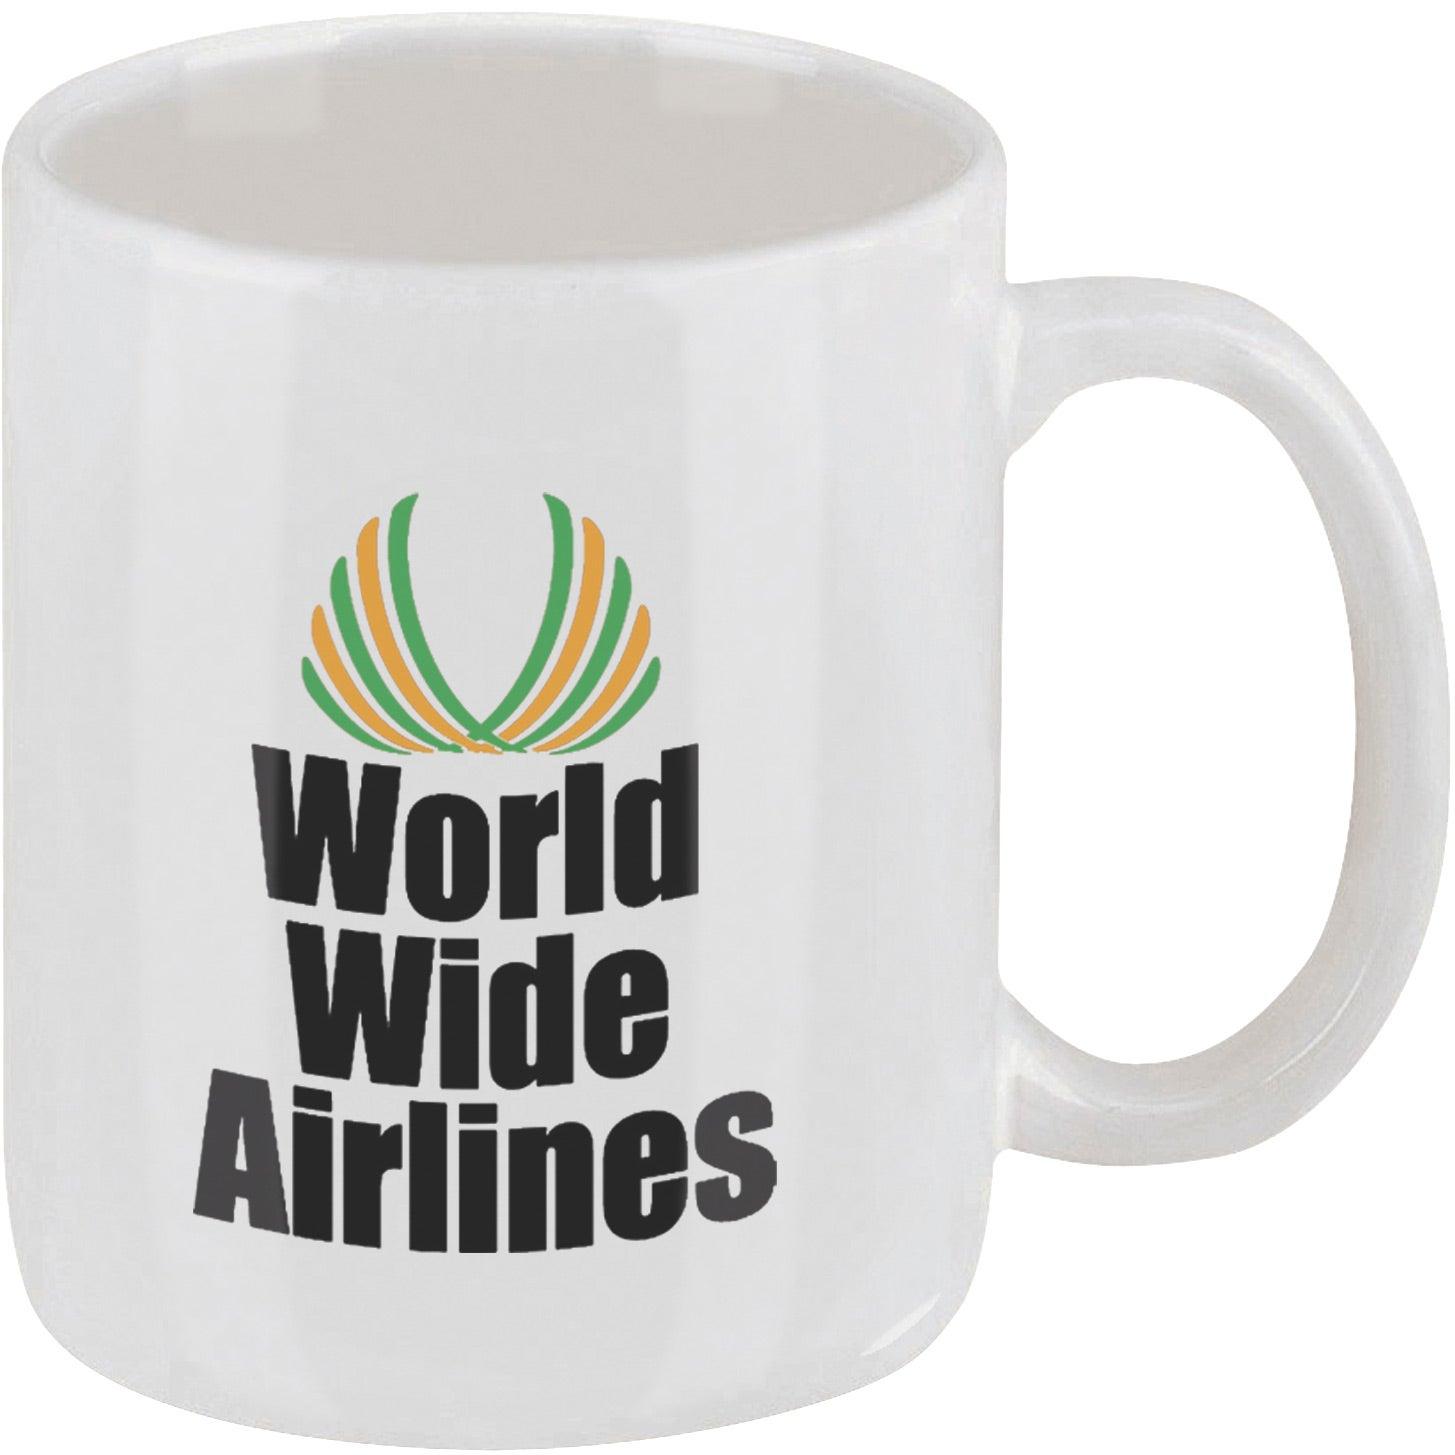 Click Here To Order 11 Oz White Classic Ironstone Mugs